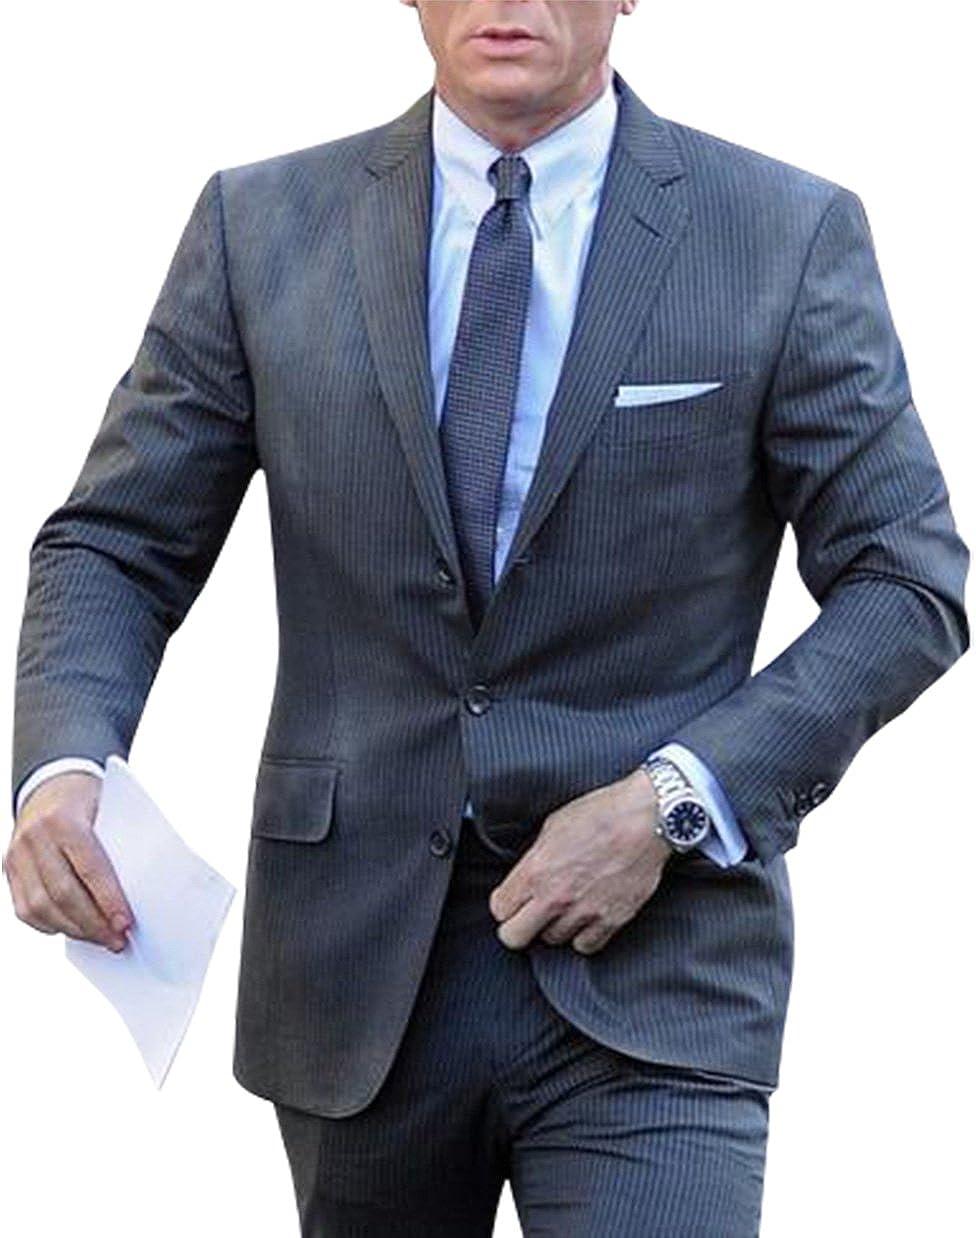 Lp Facon James Bond Skyfall Movie Daniel Craig Grey Suit At